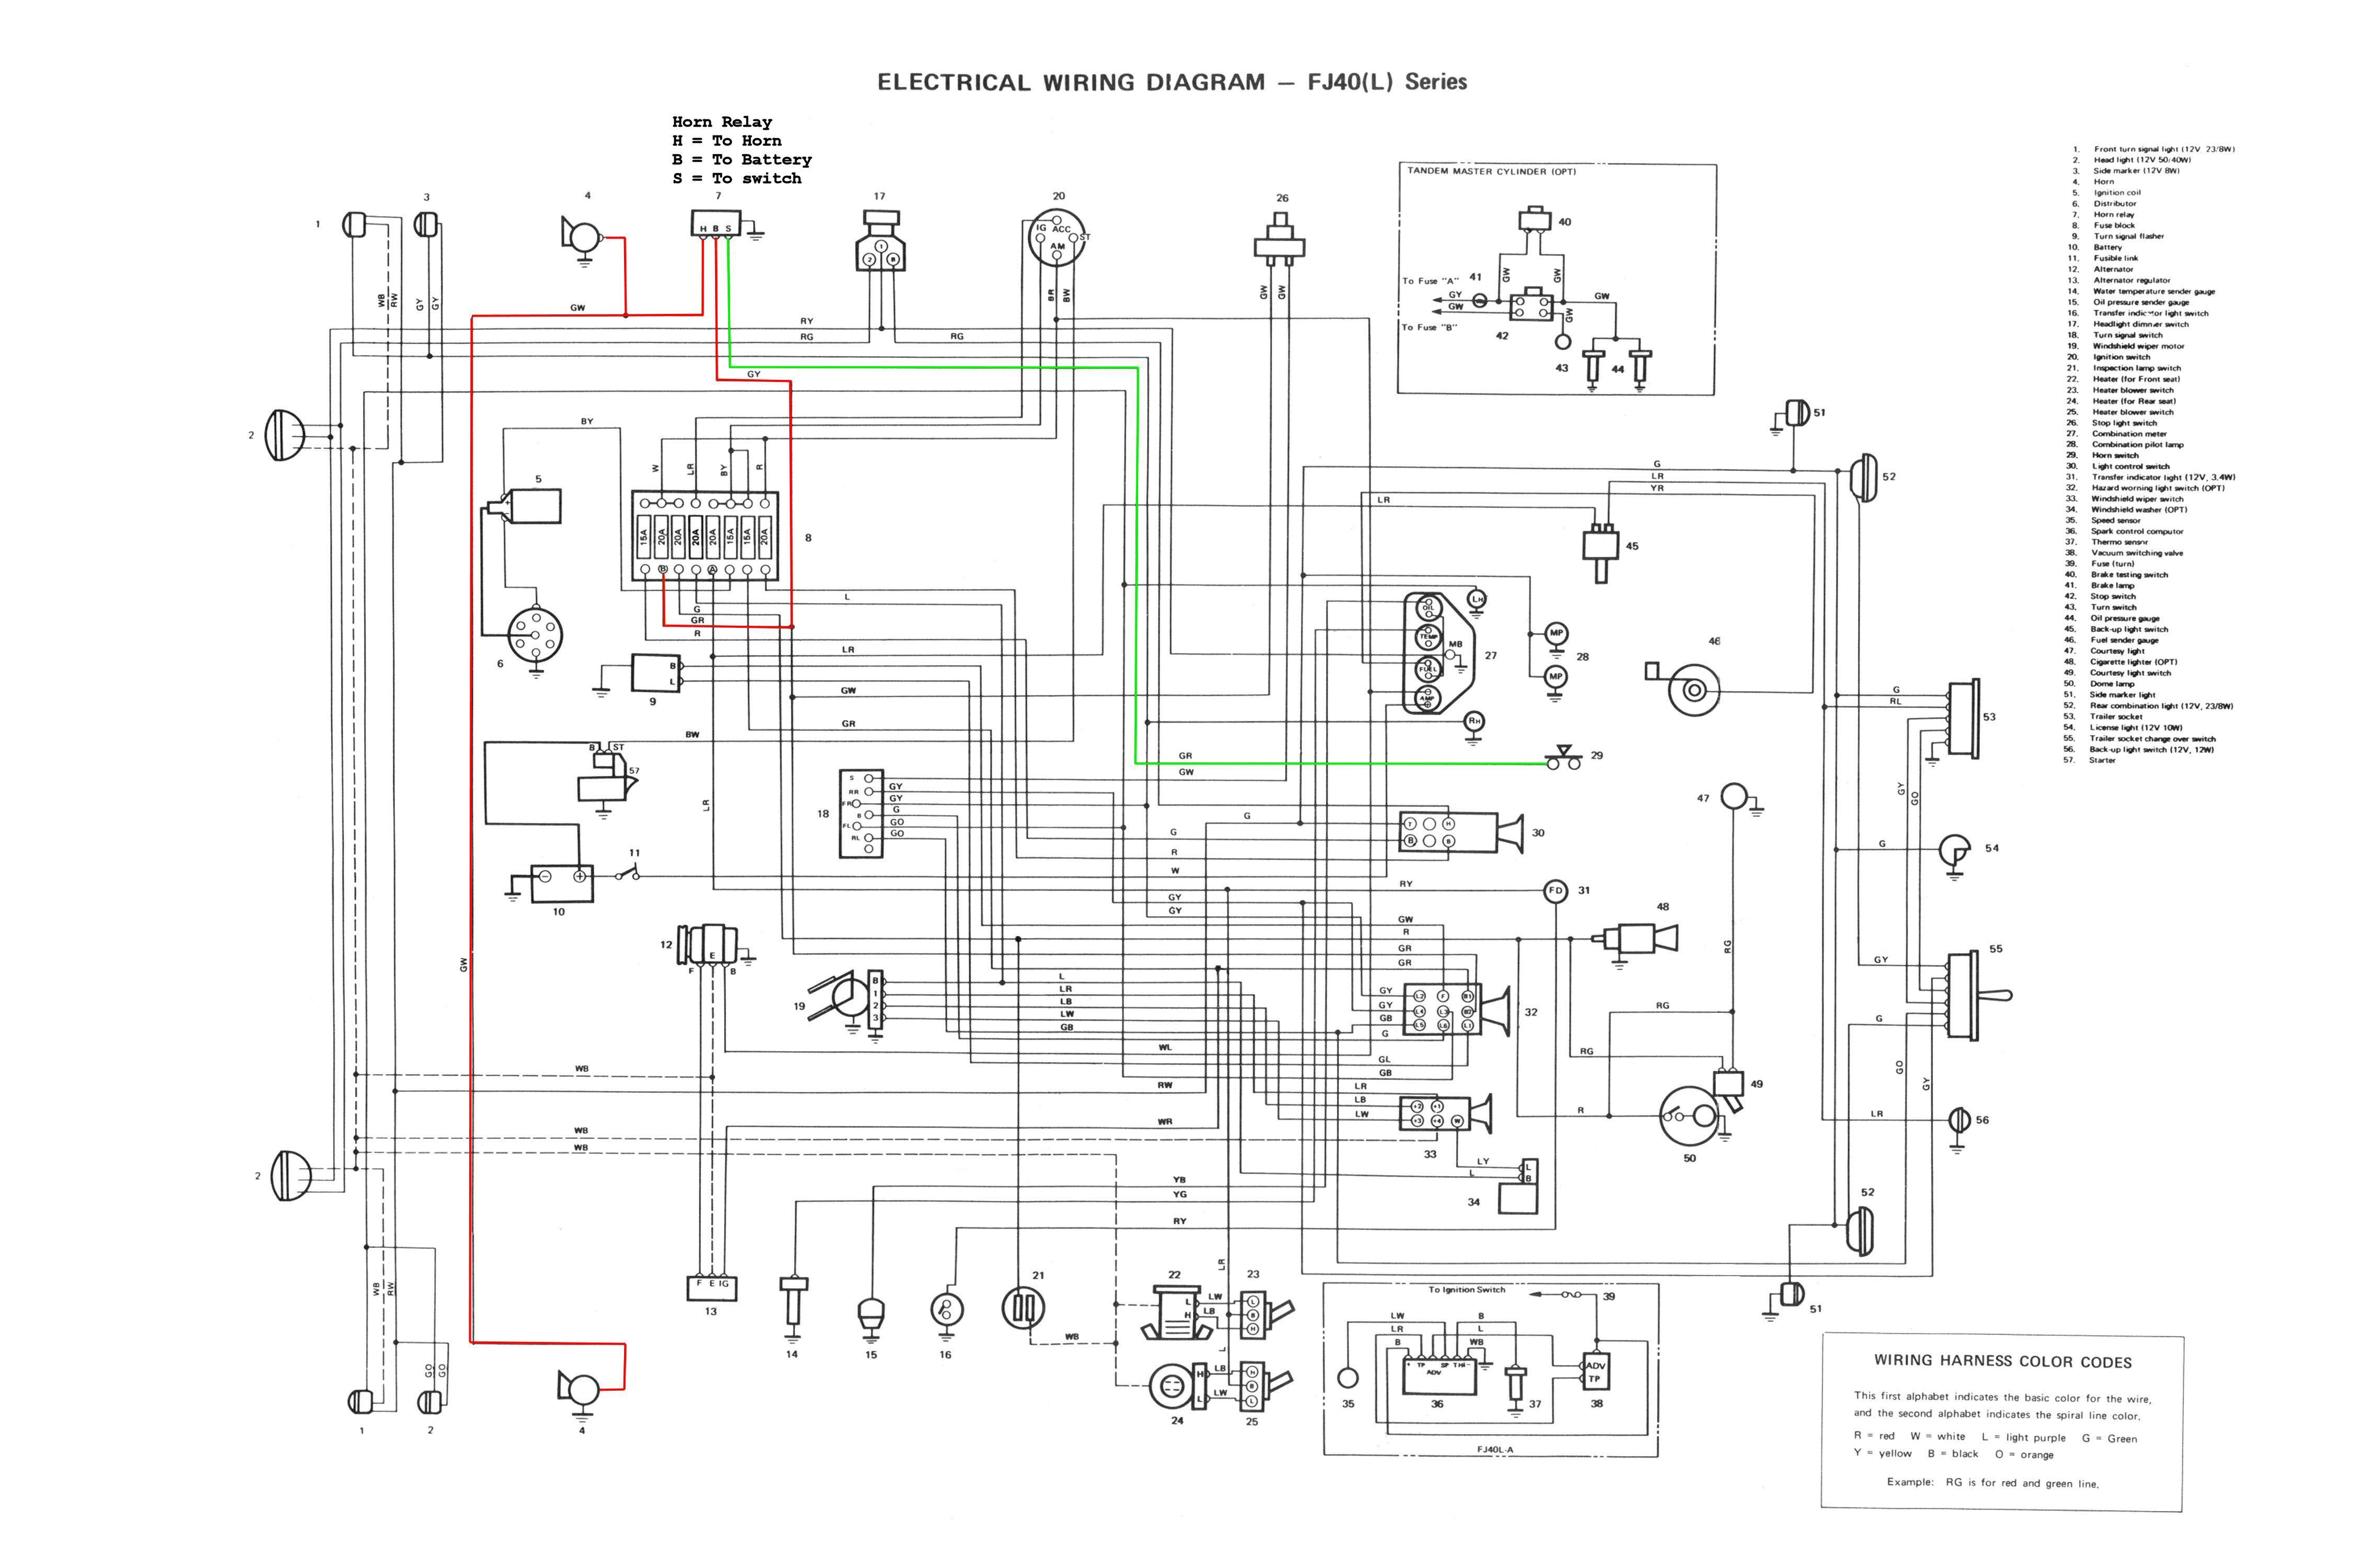 Vdj79 Wiring Diagram Toyota Landcruiser 79 Series